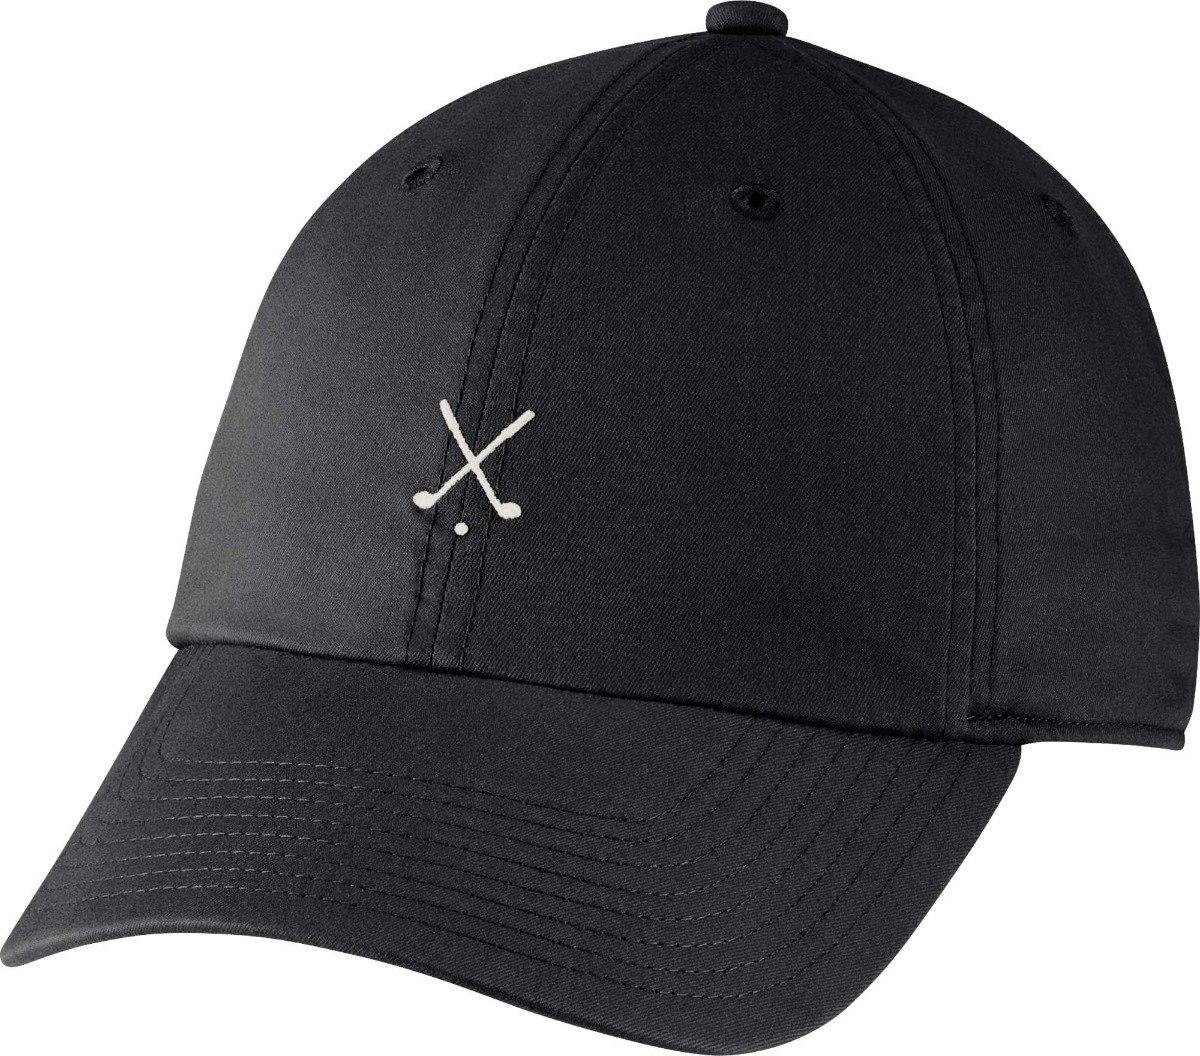 35b081daa8d7a Gorra Nike Heritage 86 2259-010 - Buke Golf -   1.120